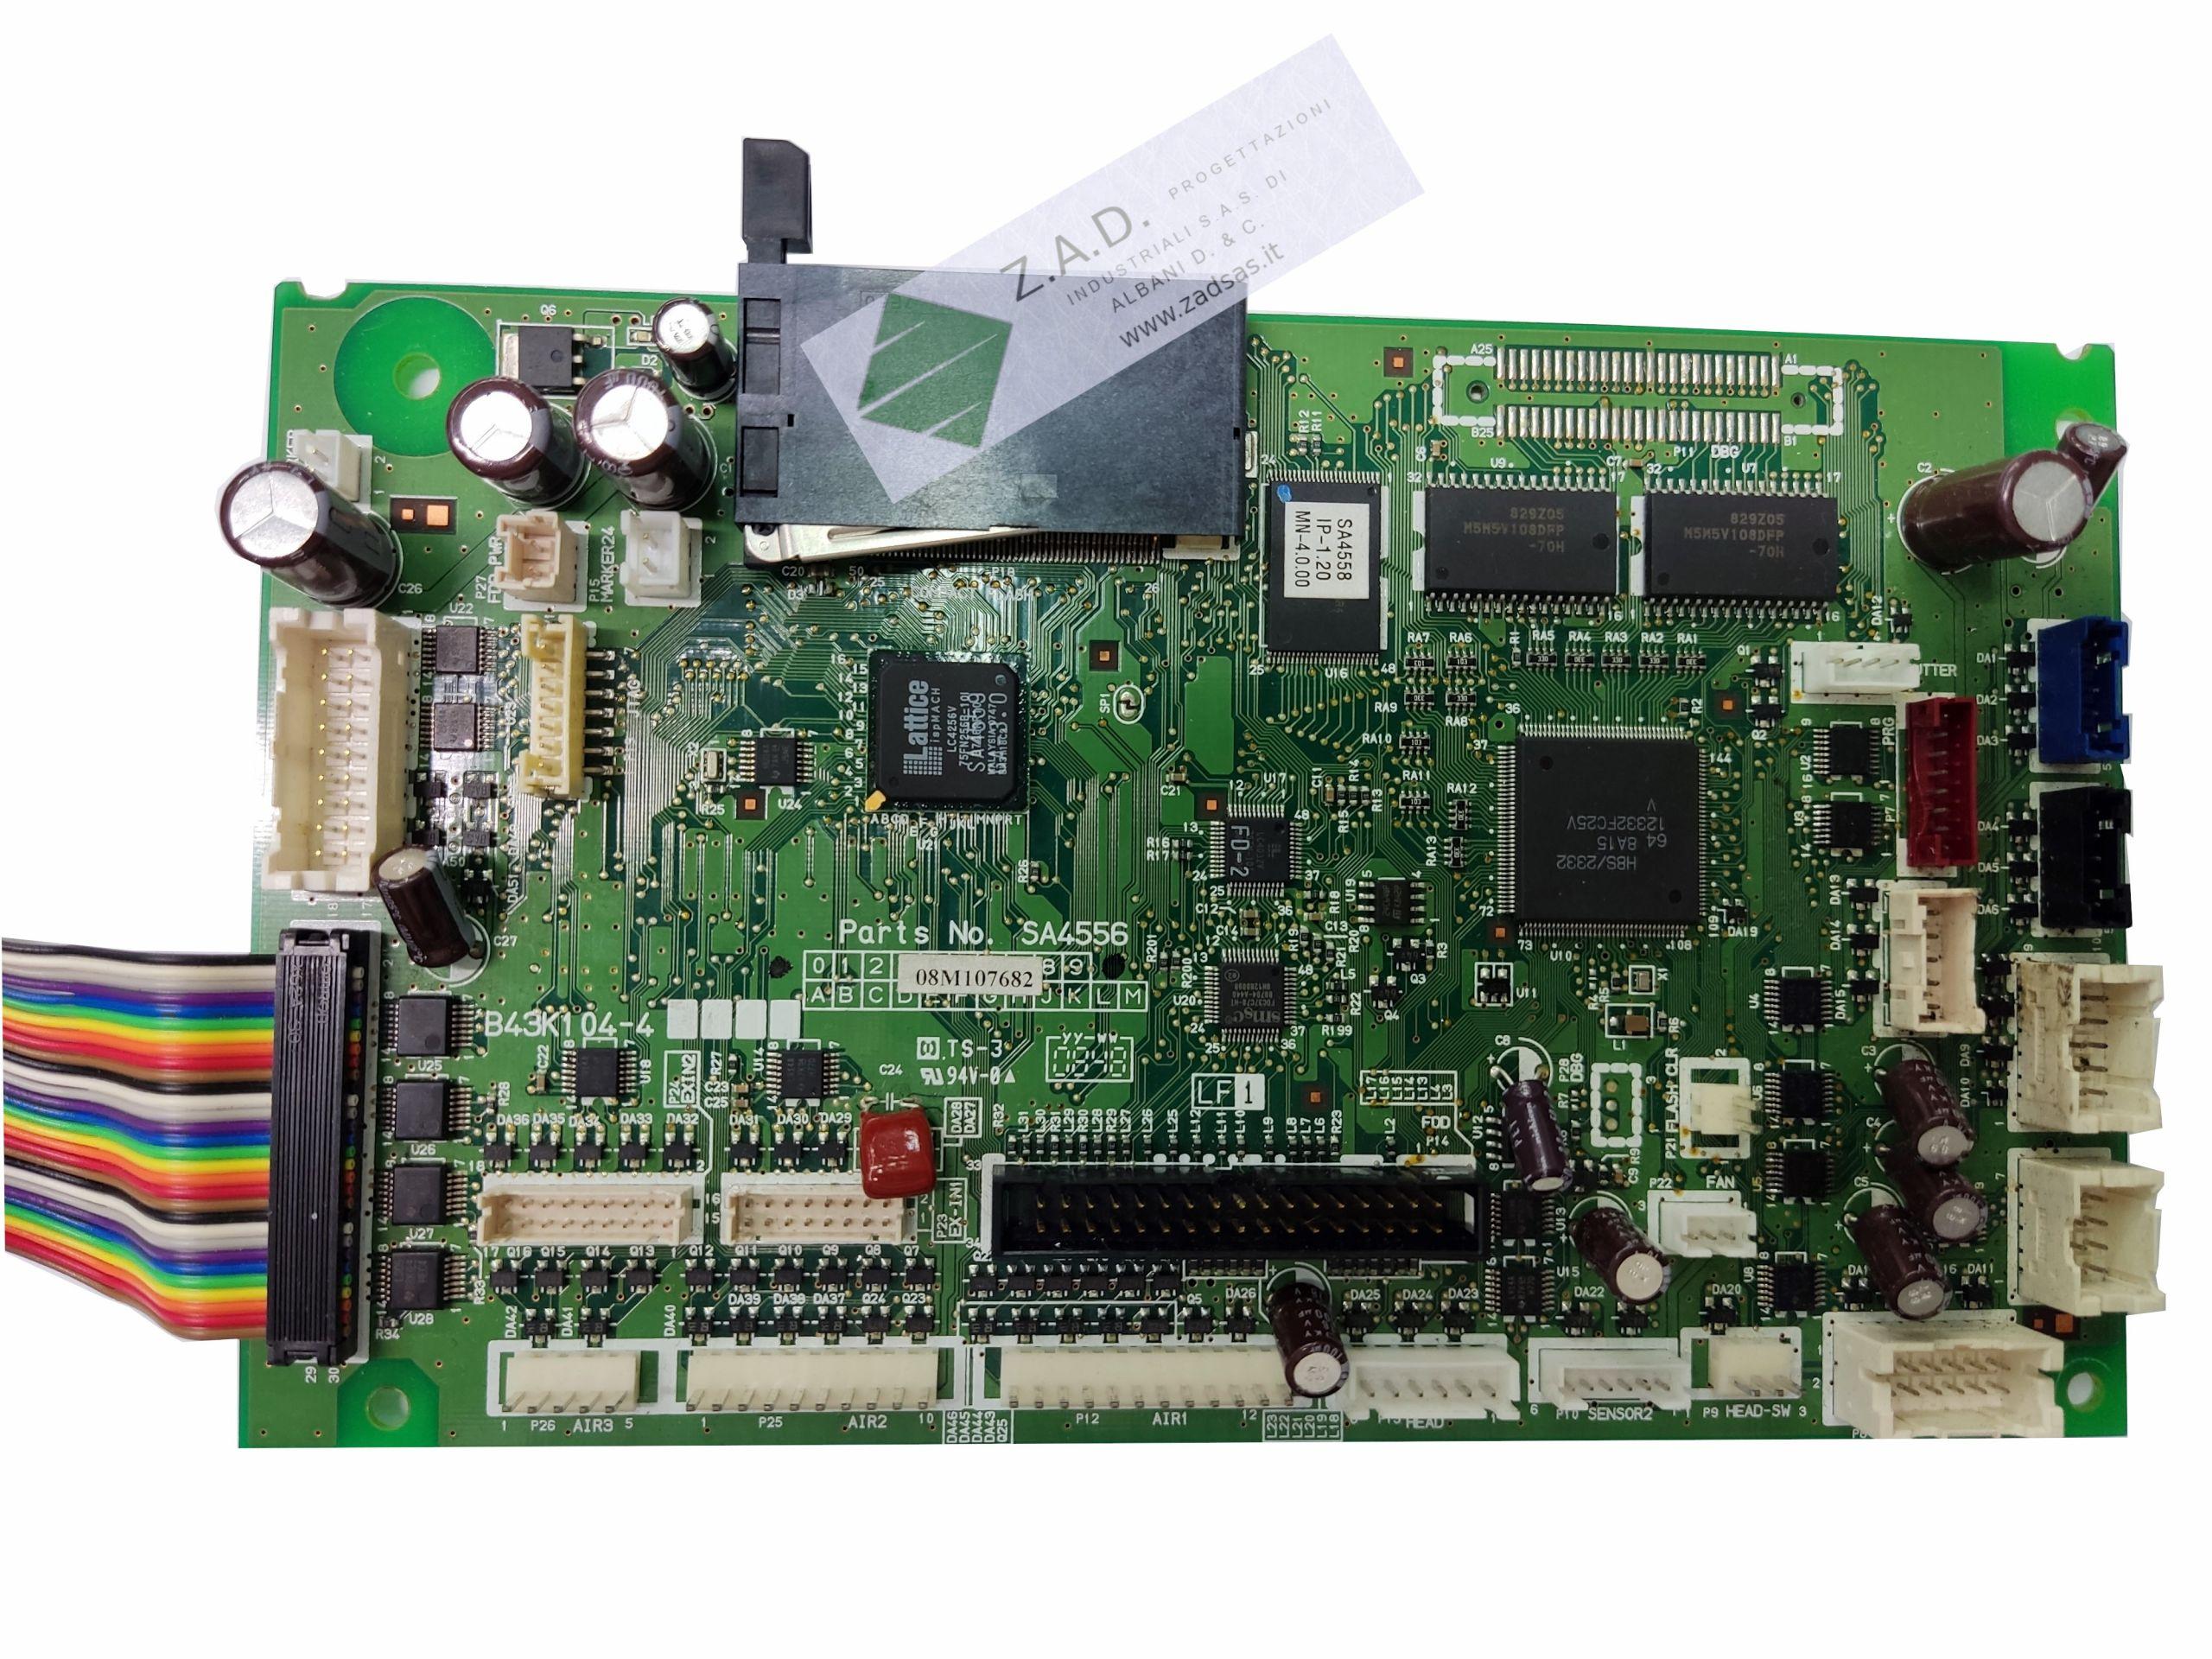 Brother G series compatible main board (Brother code:  SA4556001 )